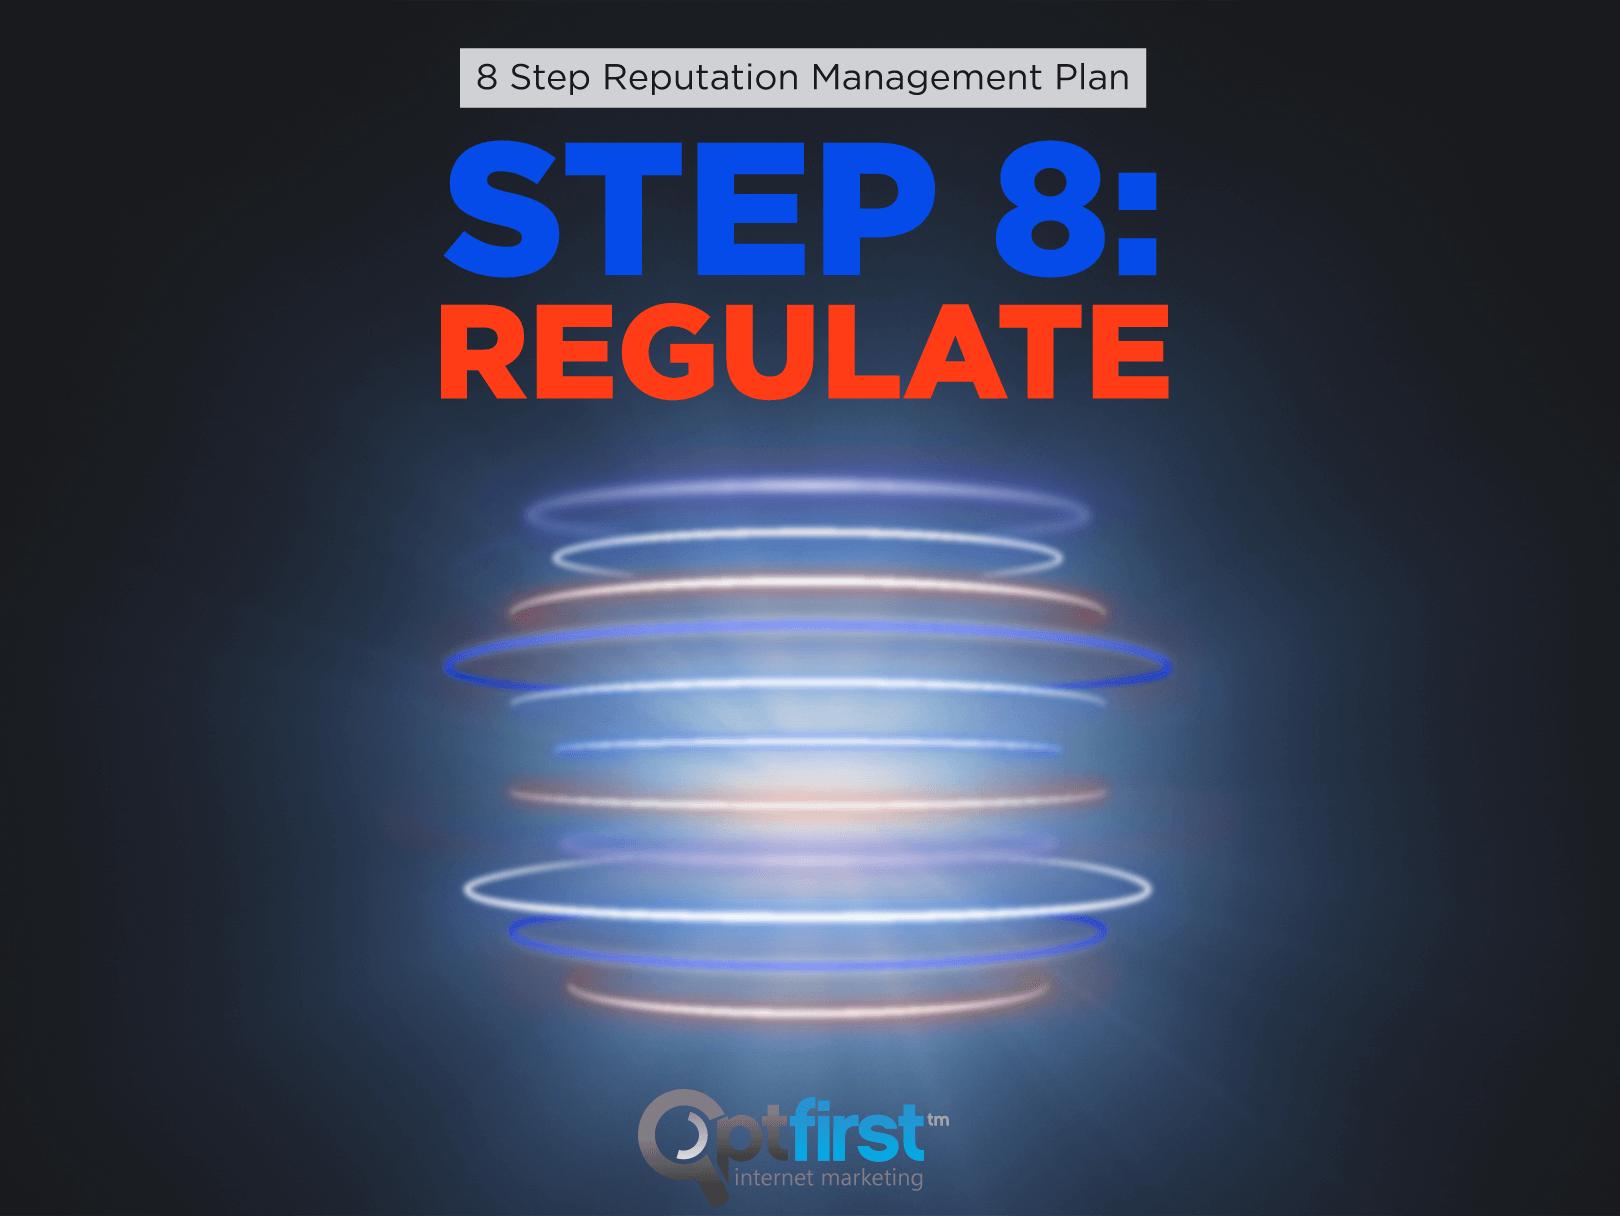 8 Step Online Reputation Management